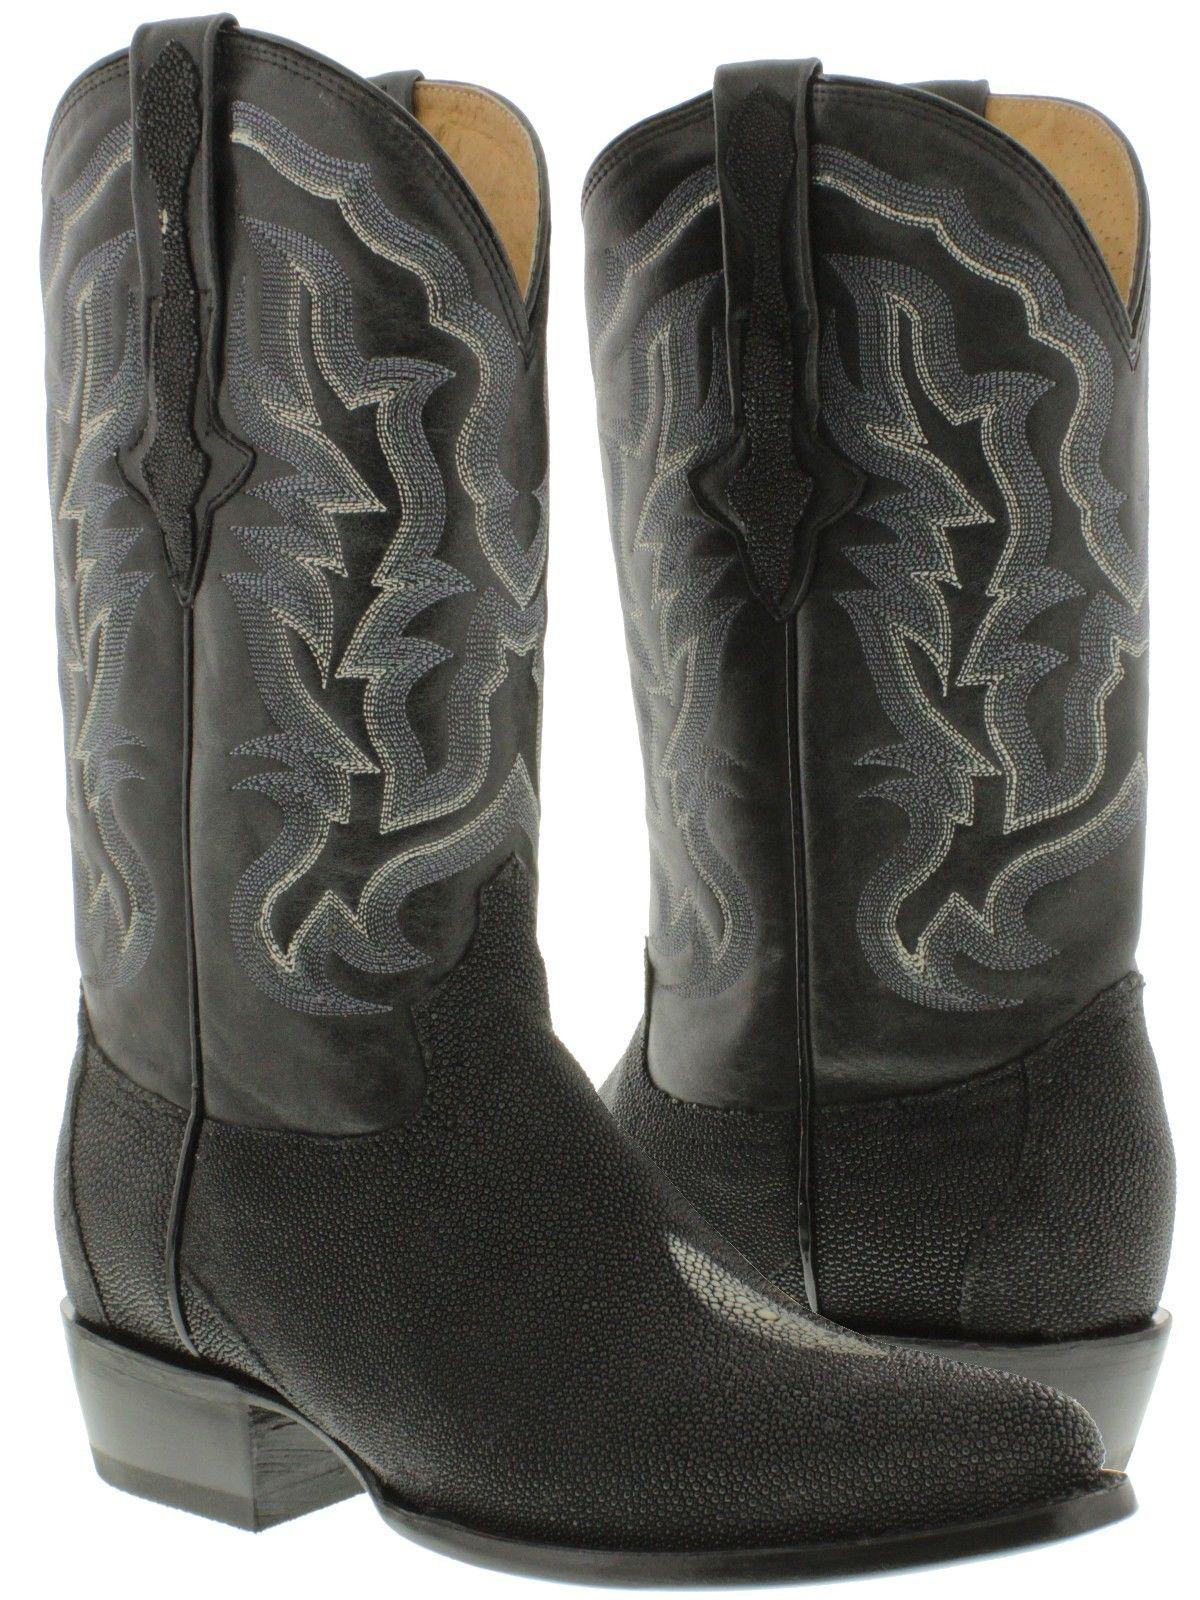 Mens Genuine Stingray Skin Leather Western Cowboy Boots